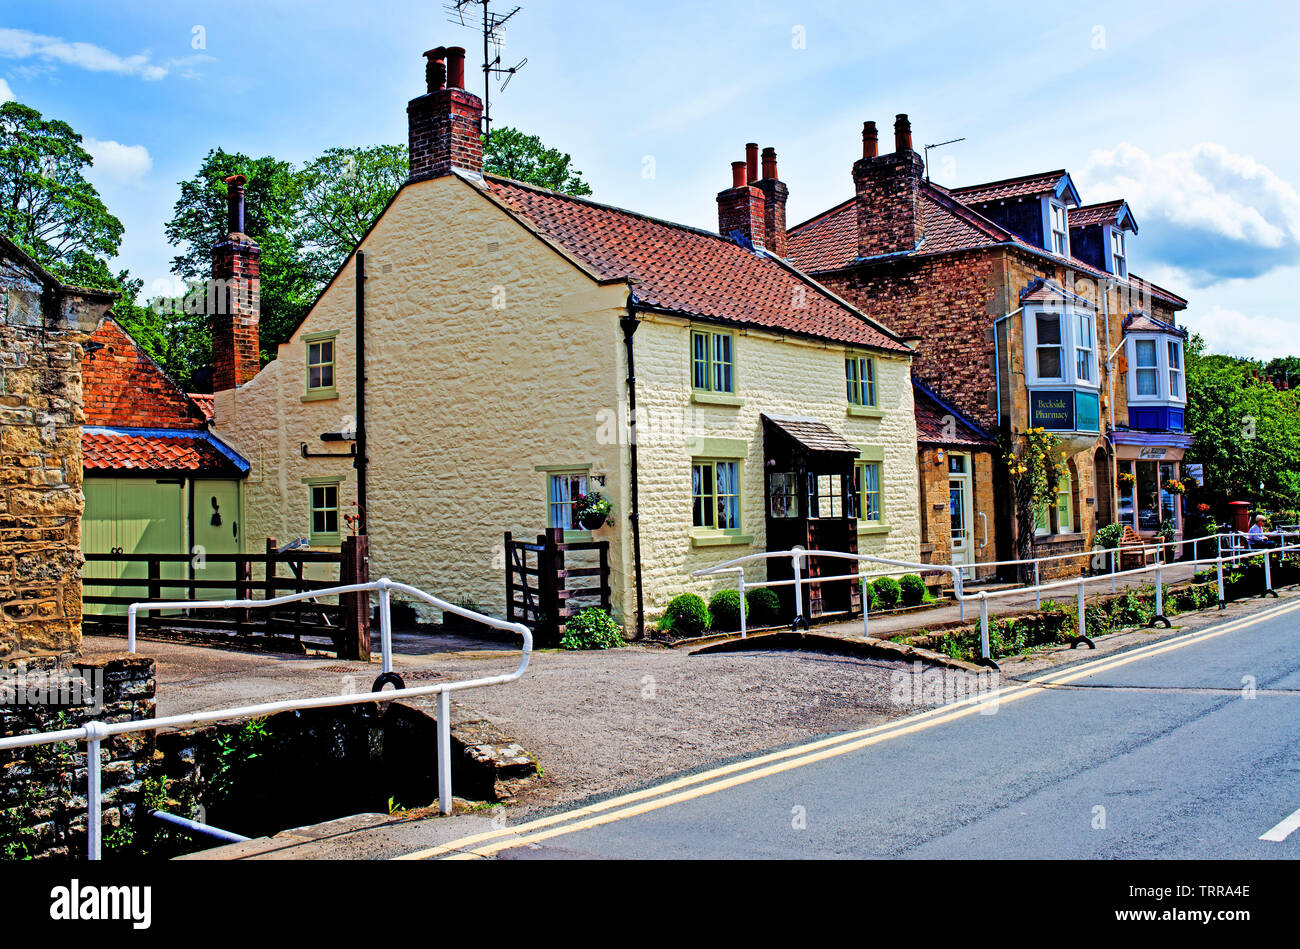 THornton Le Dale, North Yorkshire, England Stock Photo